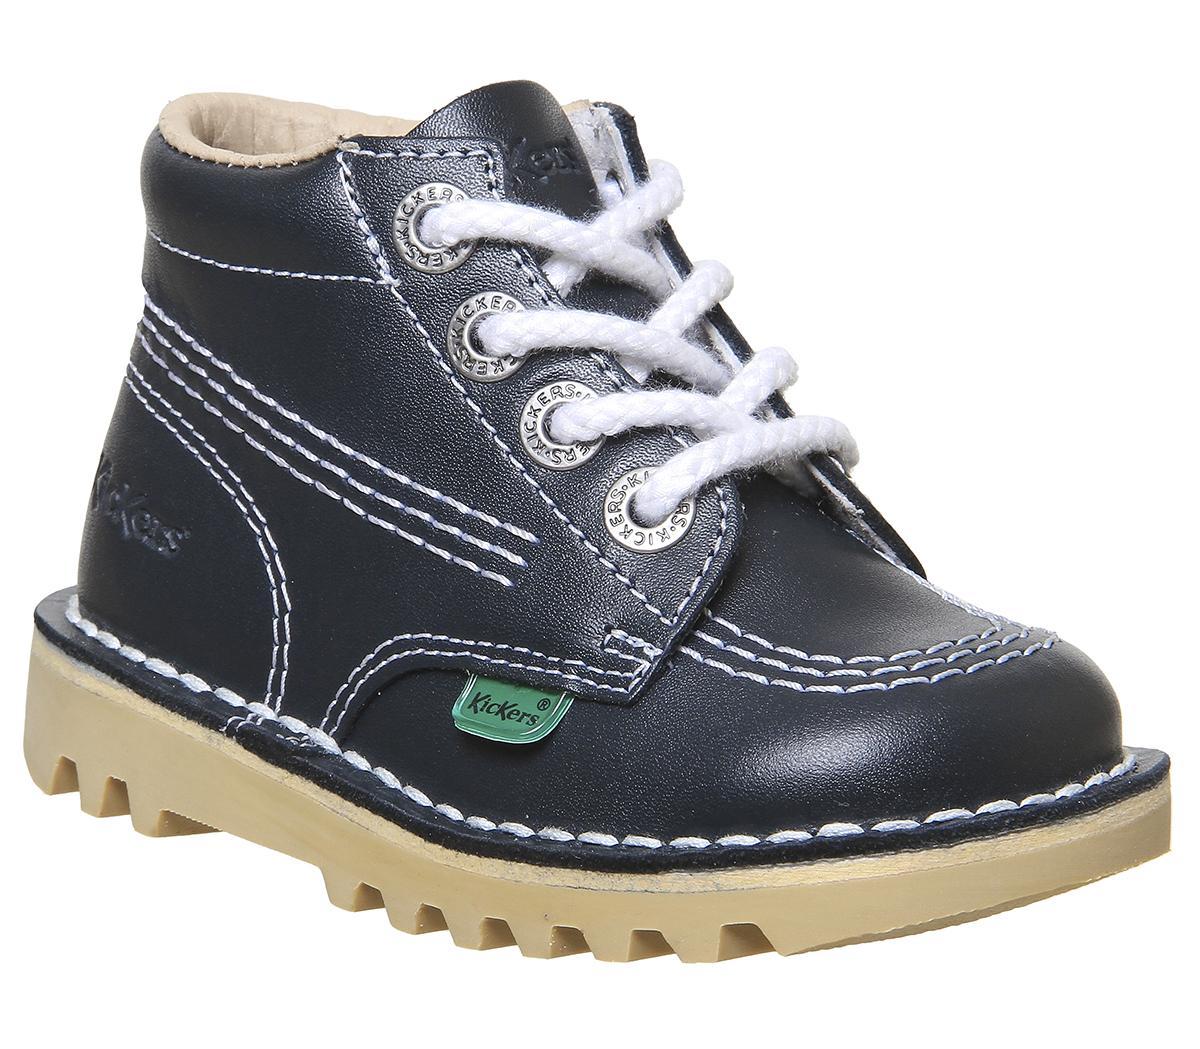 Kickers Kick Hi Infant Shoes Dark Blue